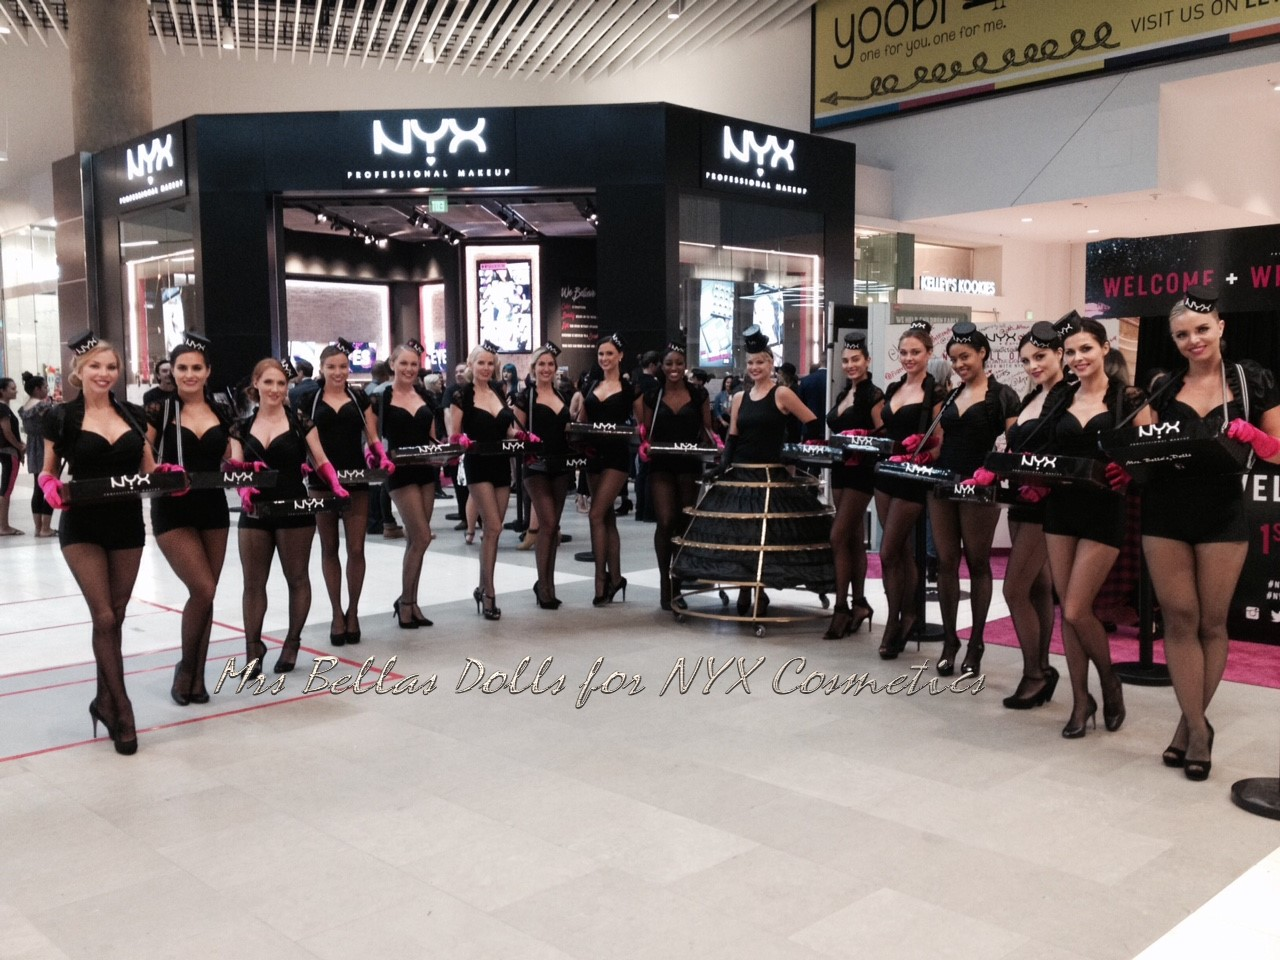 Candy Girls & Strolling Skirt